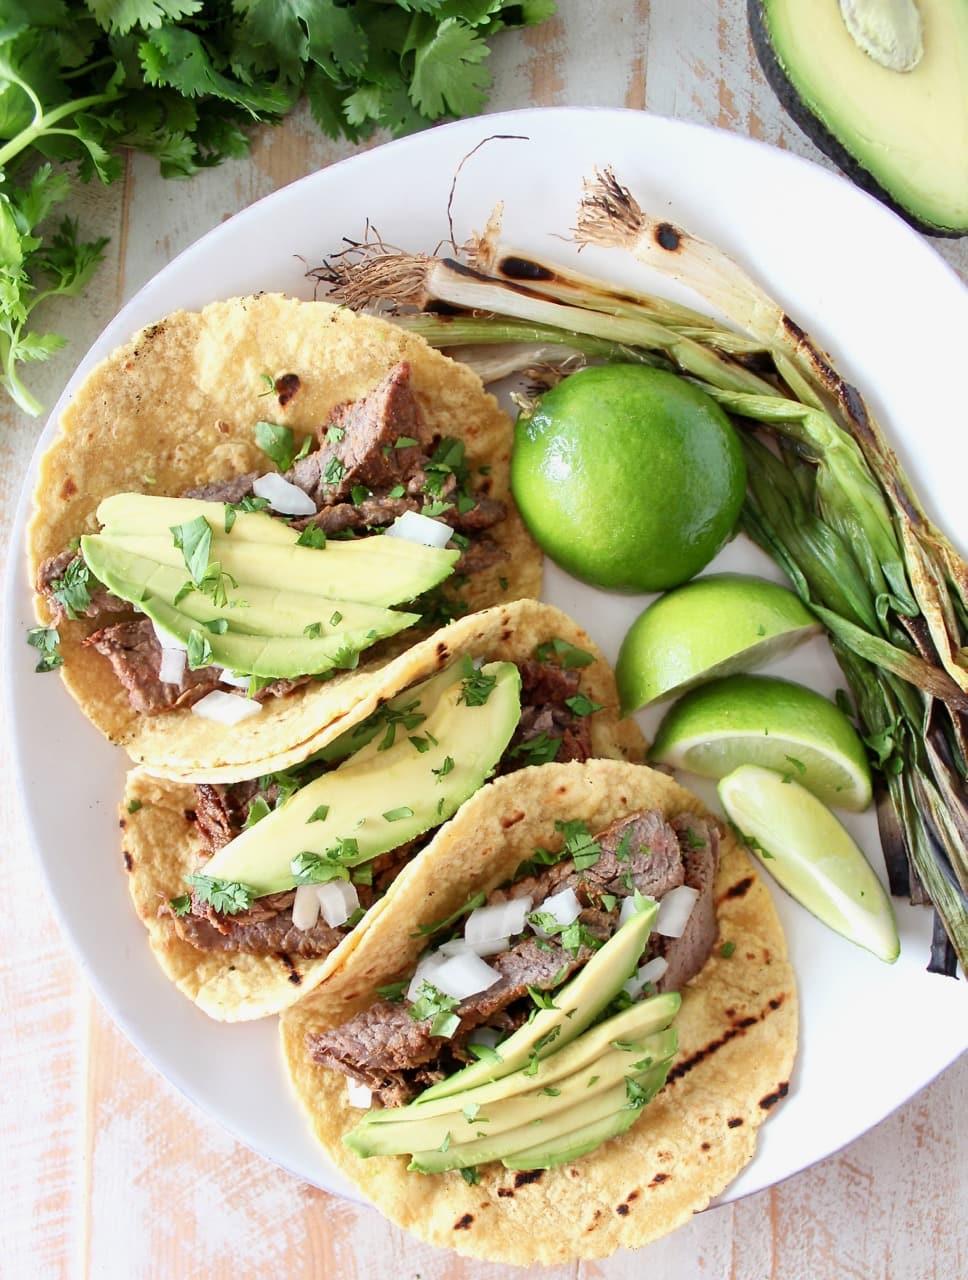 Carne Asada Taco Recipe with Fresh Limes, Avocado and Onions